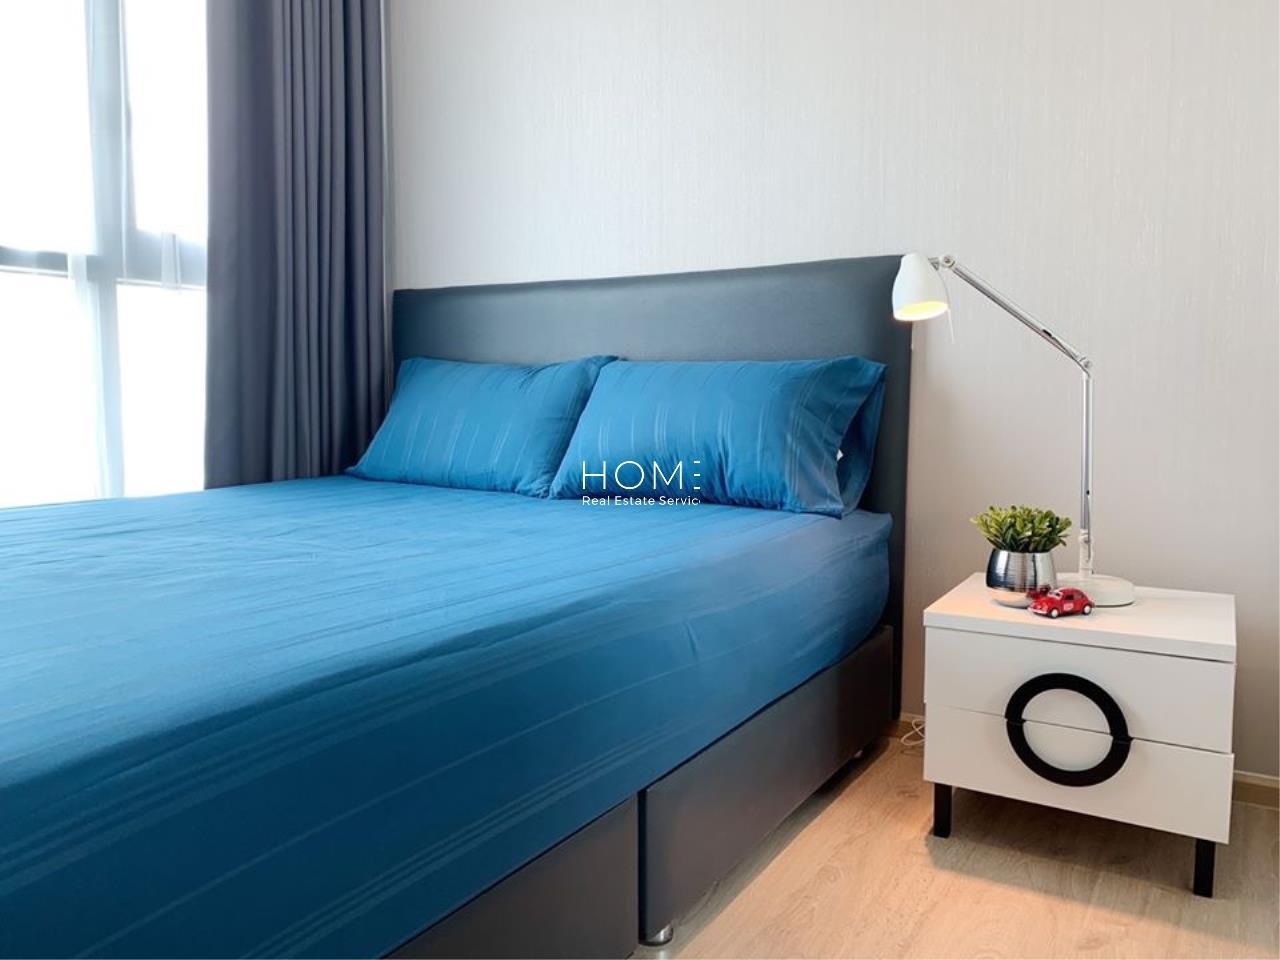 Fuse Miti Sutthisan - Ratchada 2 Beds FOR SALE ฟิวส์ มิติ สุทธิสาร-รัชดา 2 ห้องนอน ขาย Patter323